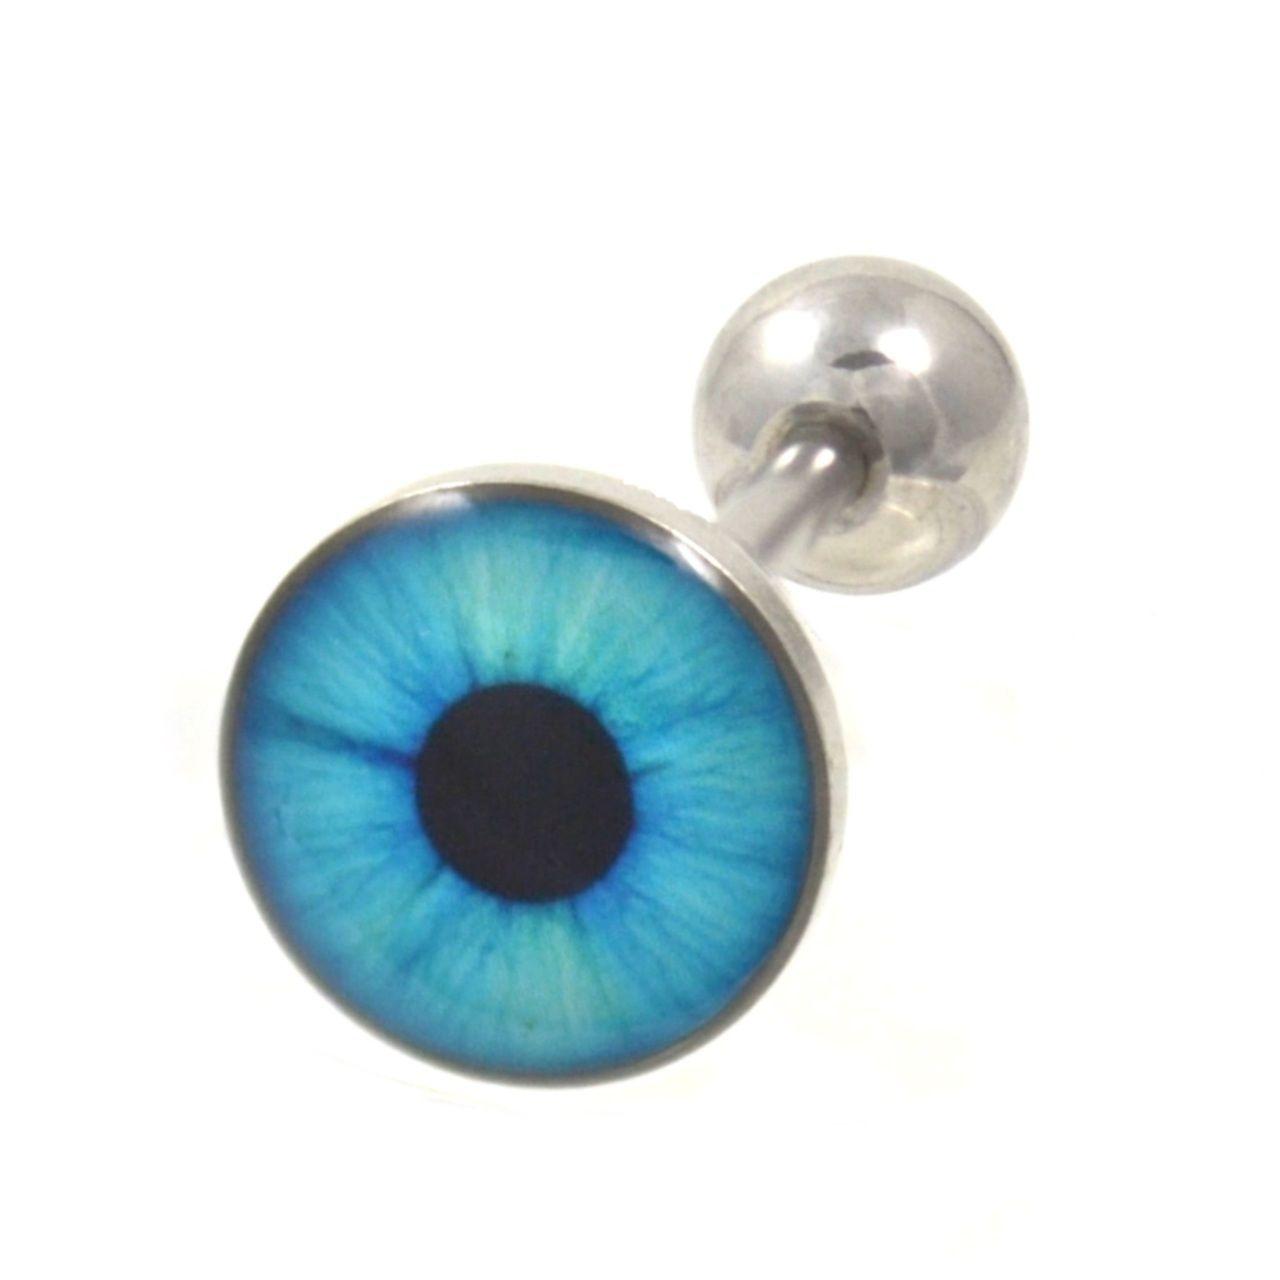 "BodyDazz.com - The Blue Eyeball Tongue Ring Barbell 14g 5/8"", $1.99 (http://www.bodydazz.com/the-blue-eyeball-tongue-ring-barbell-14g-5-8/)"